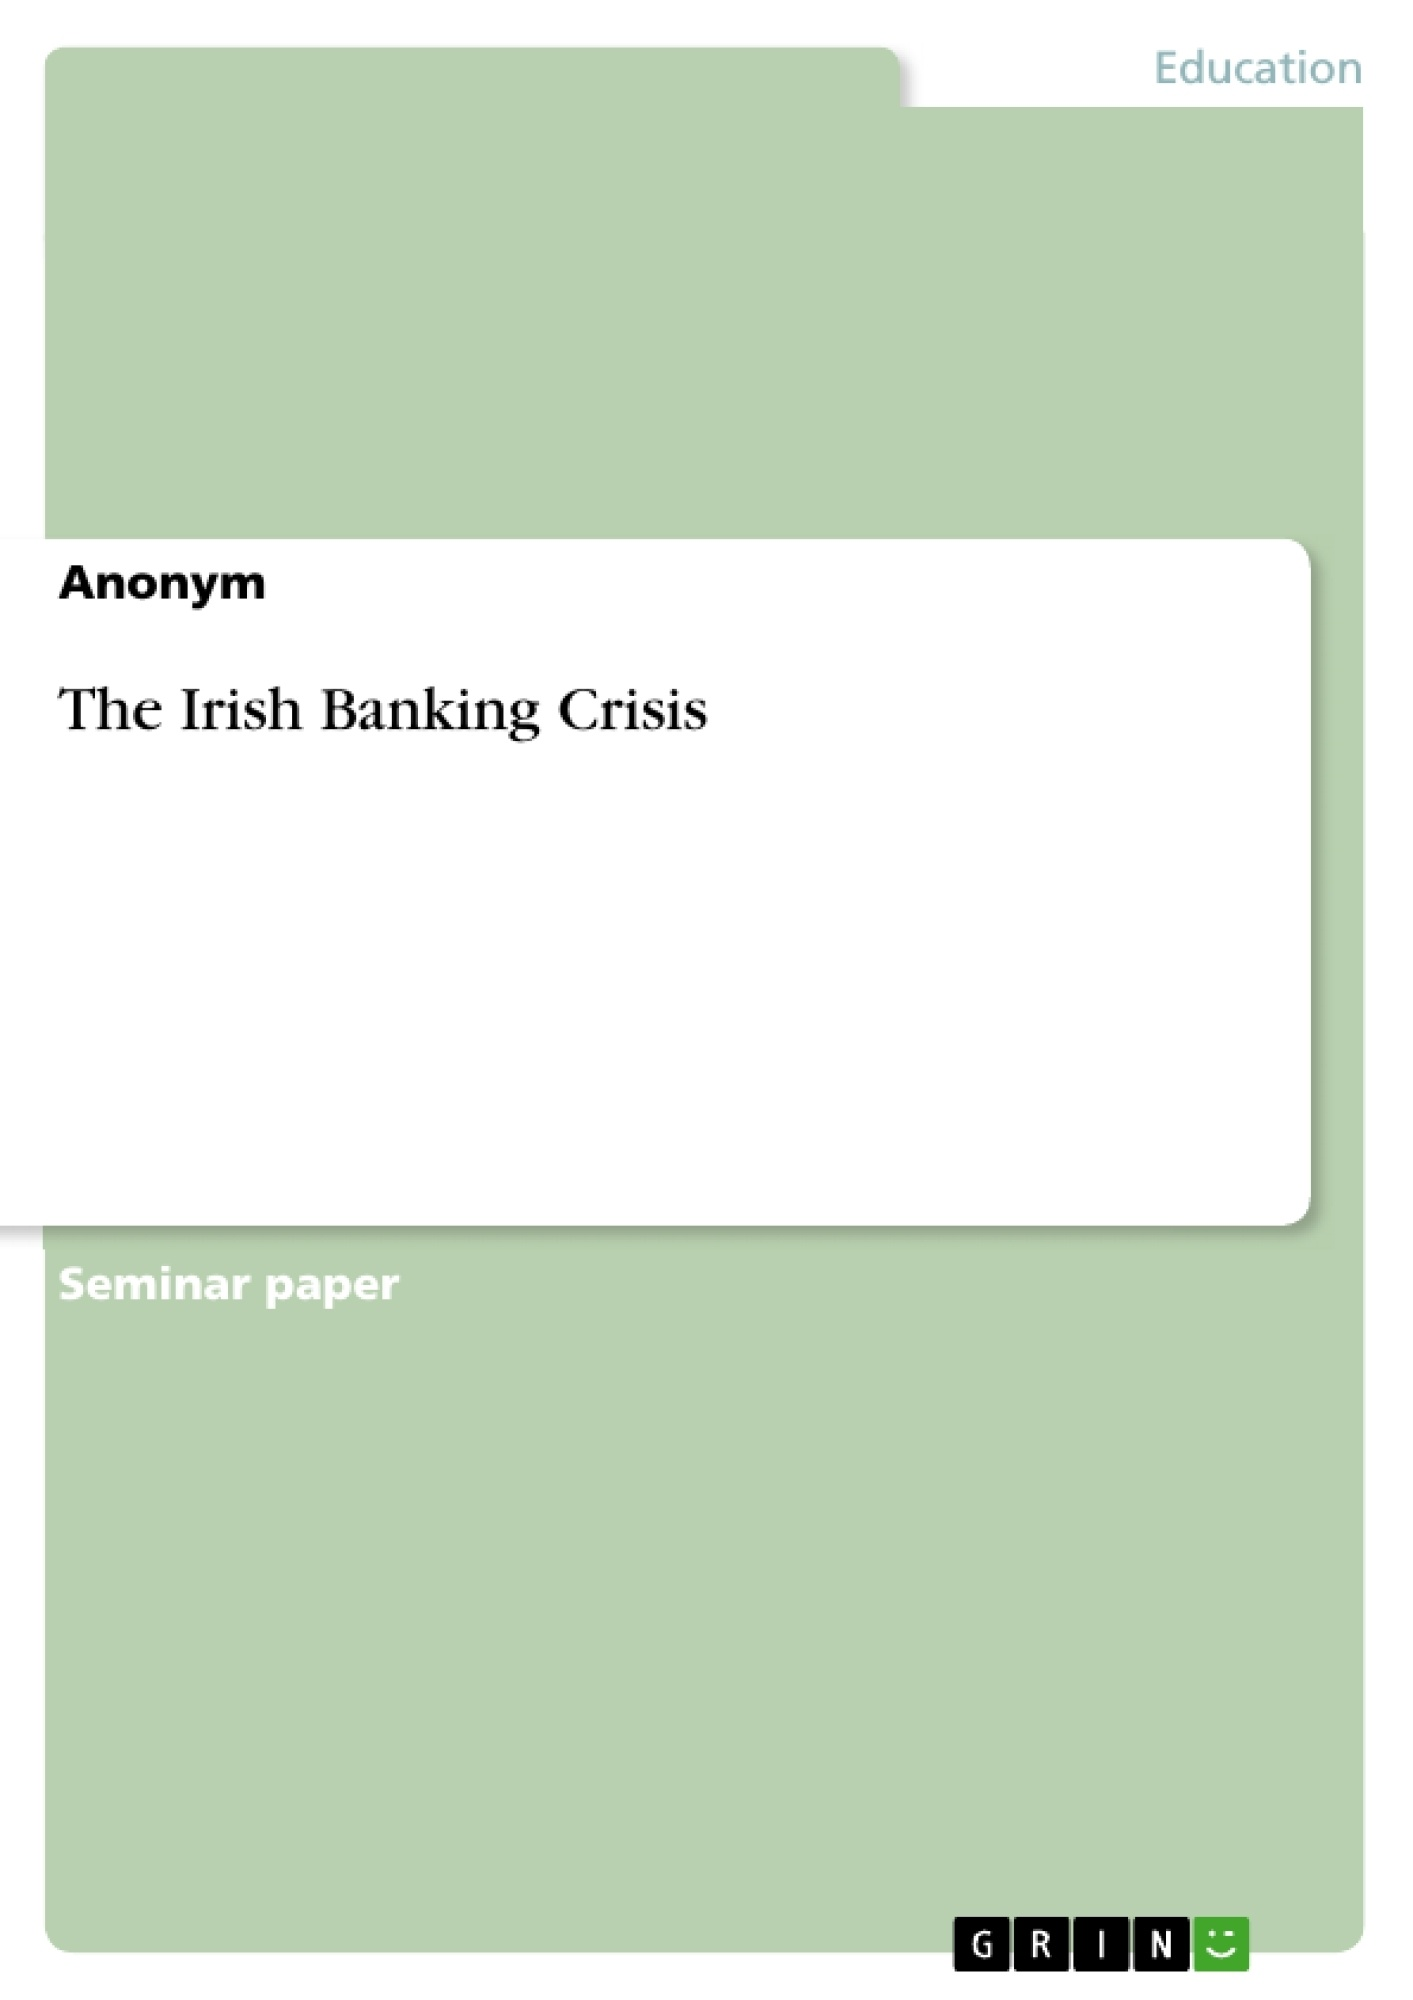 Title: The Irish Banking Crisis